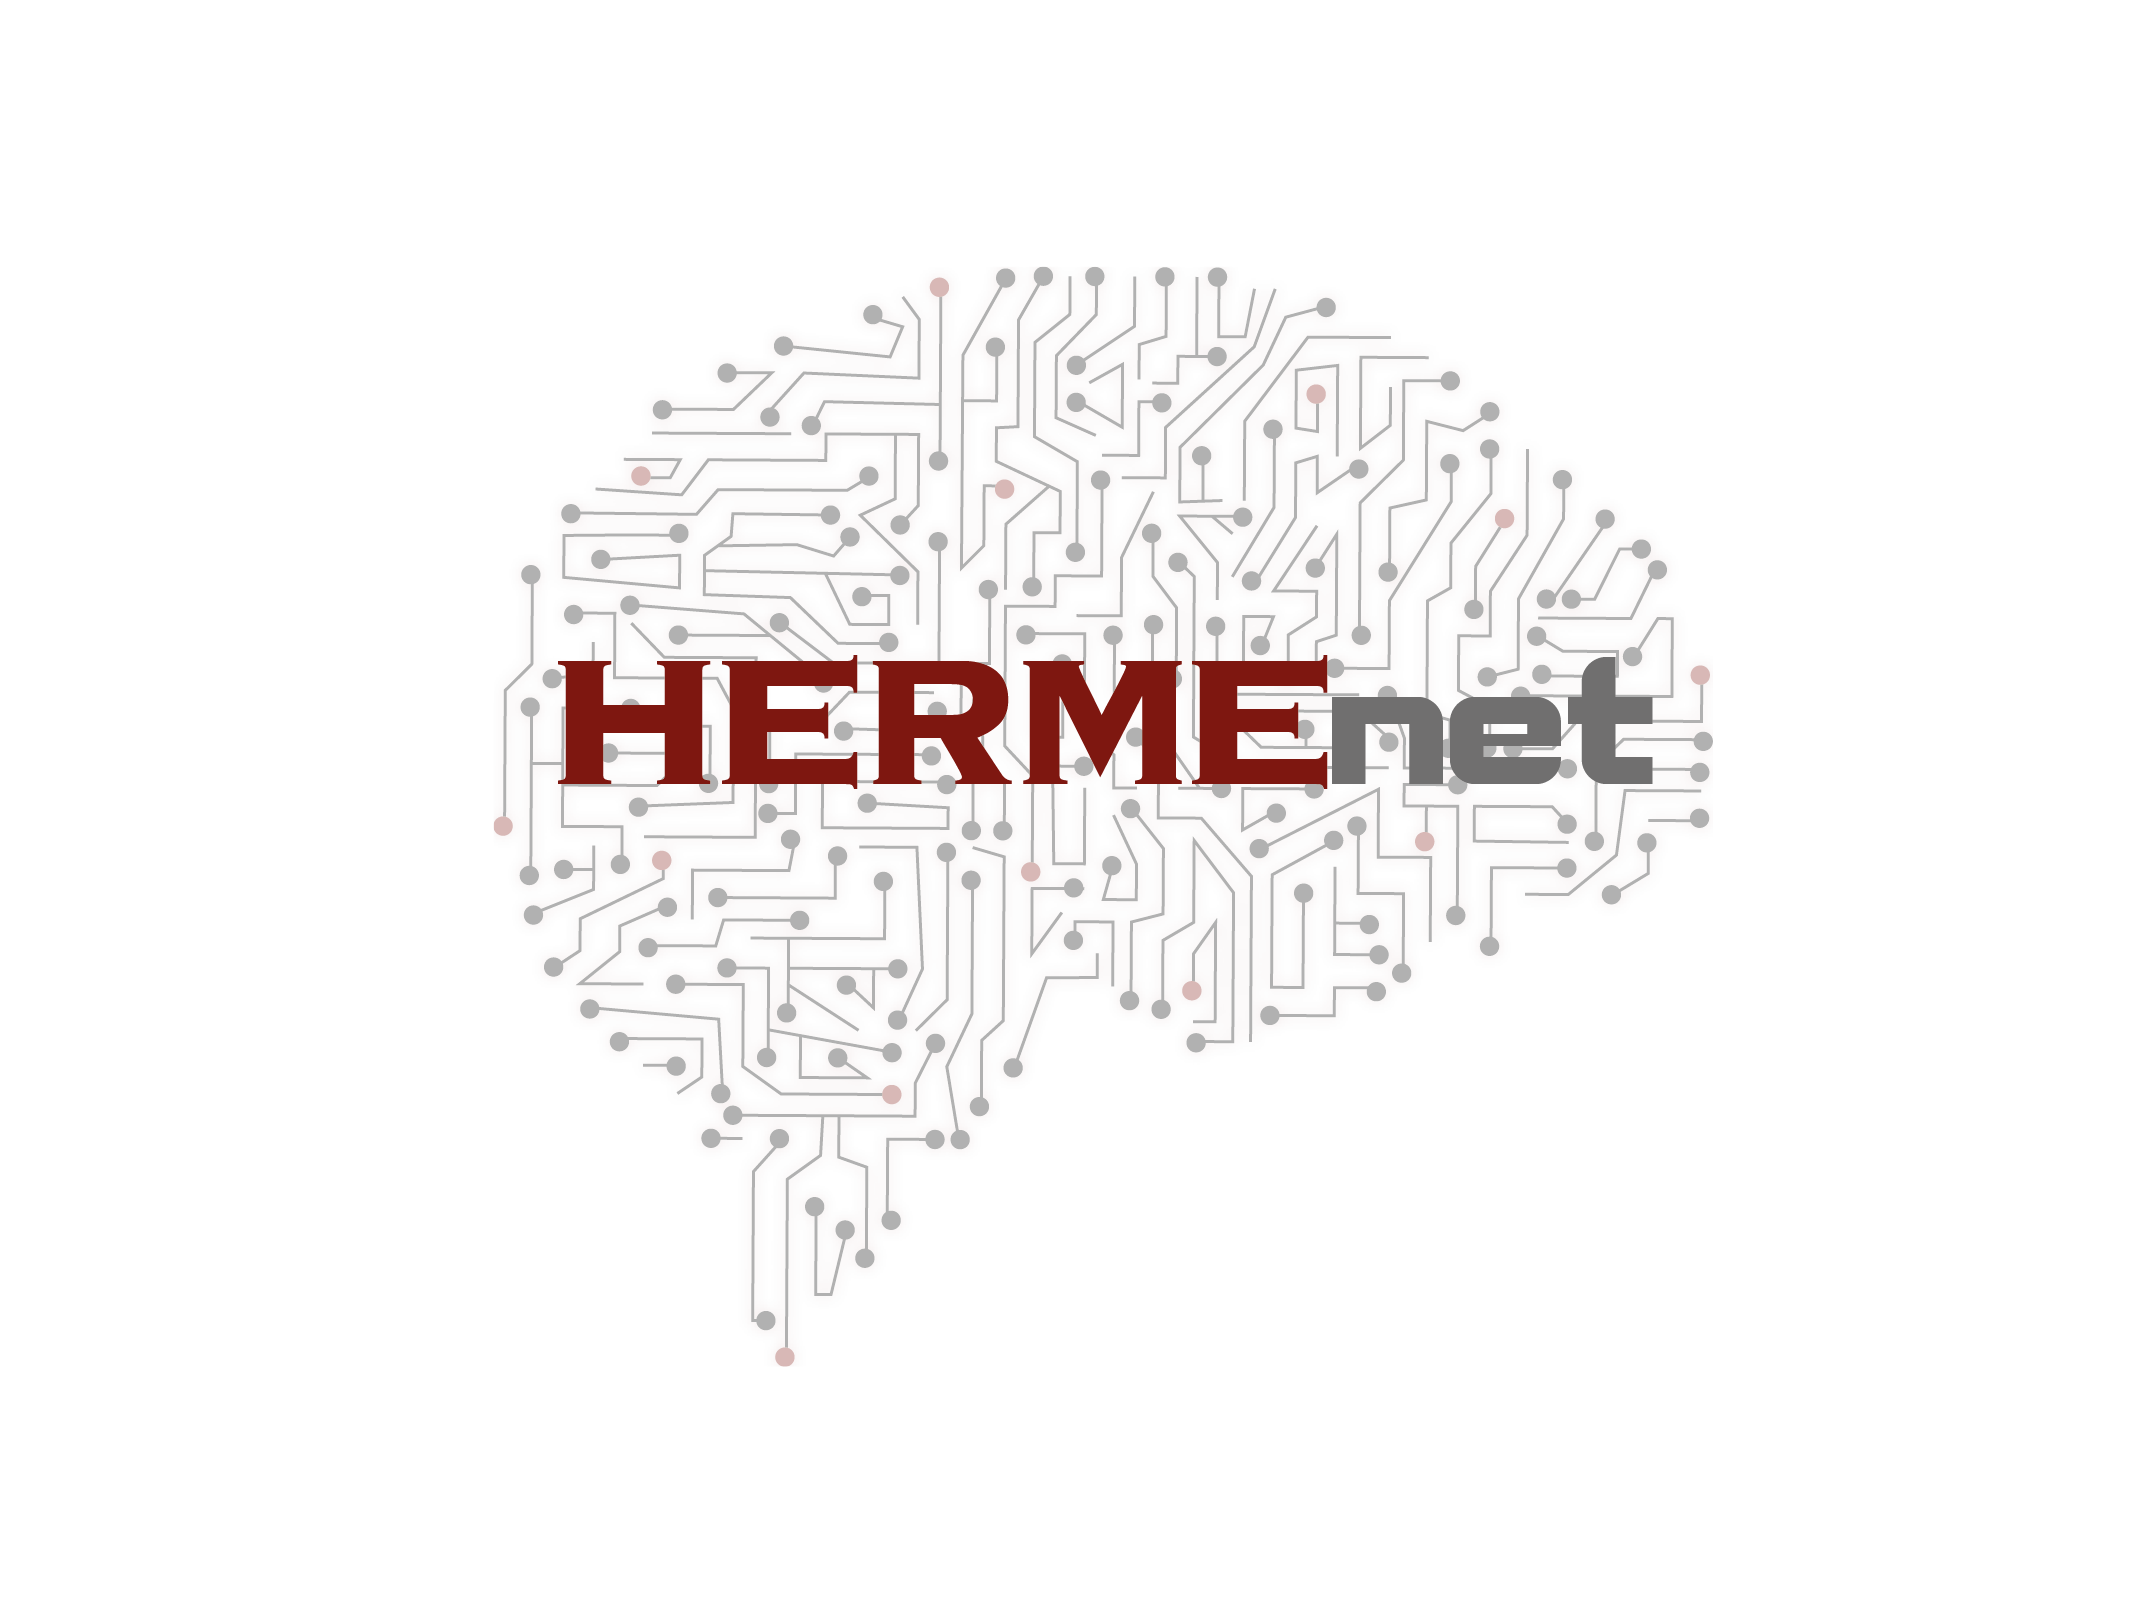 Hermeneutics Research Network